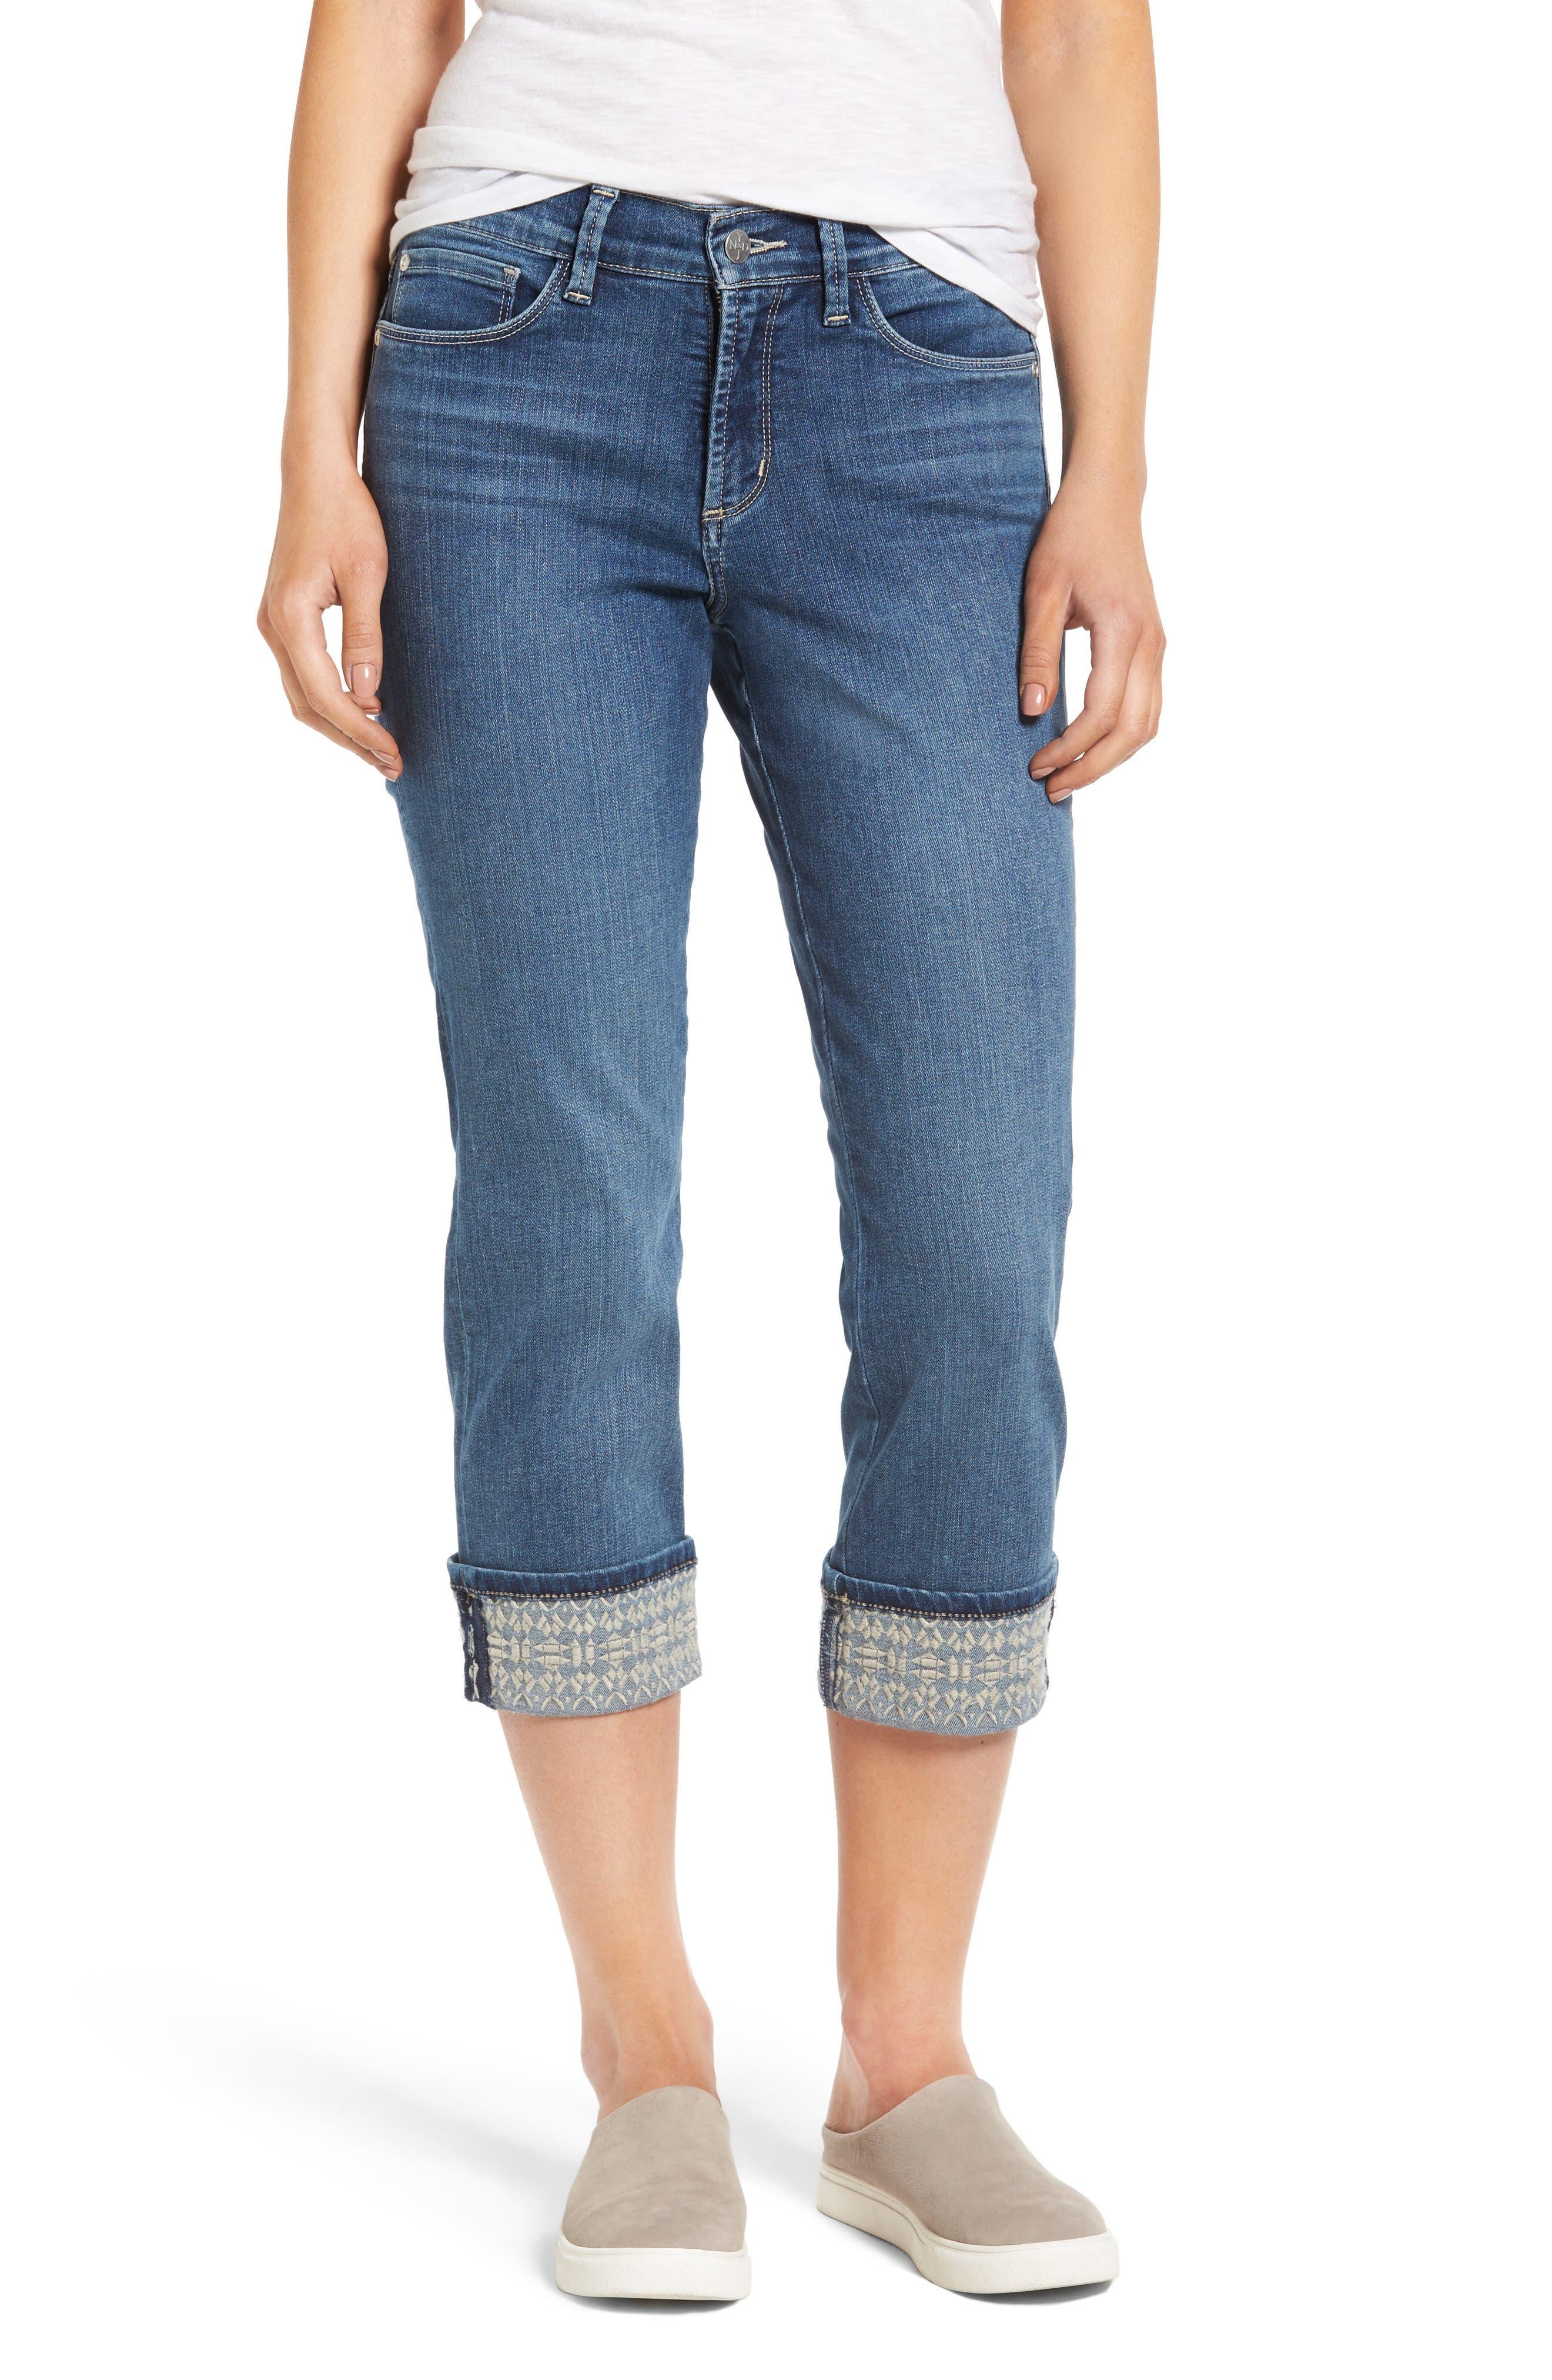 Main Image - NYDJ Dayla Embroidered Wide Cuff Capri Jeans (Heyburn)